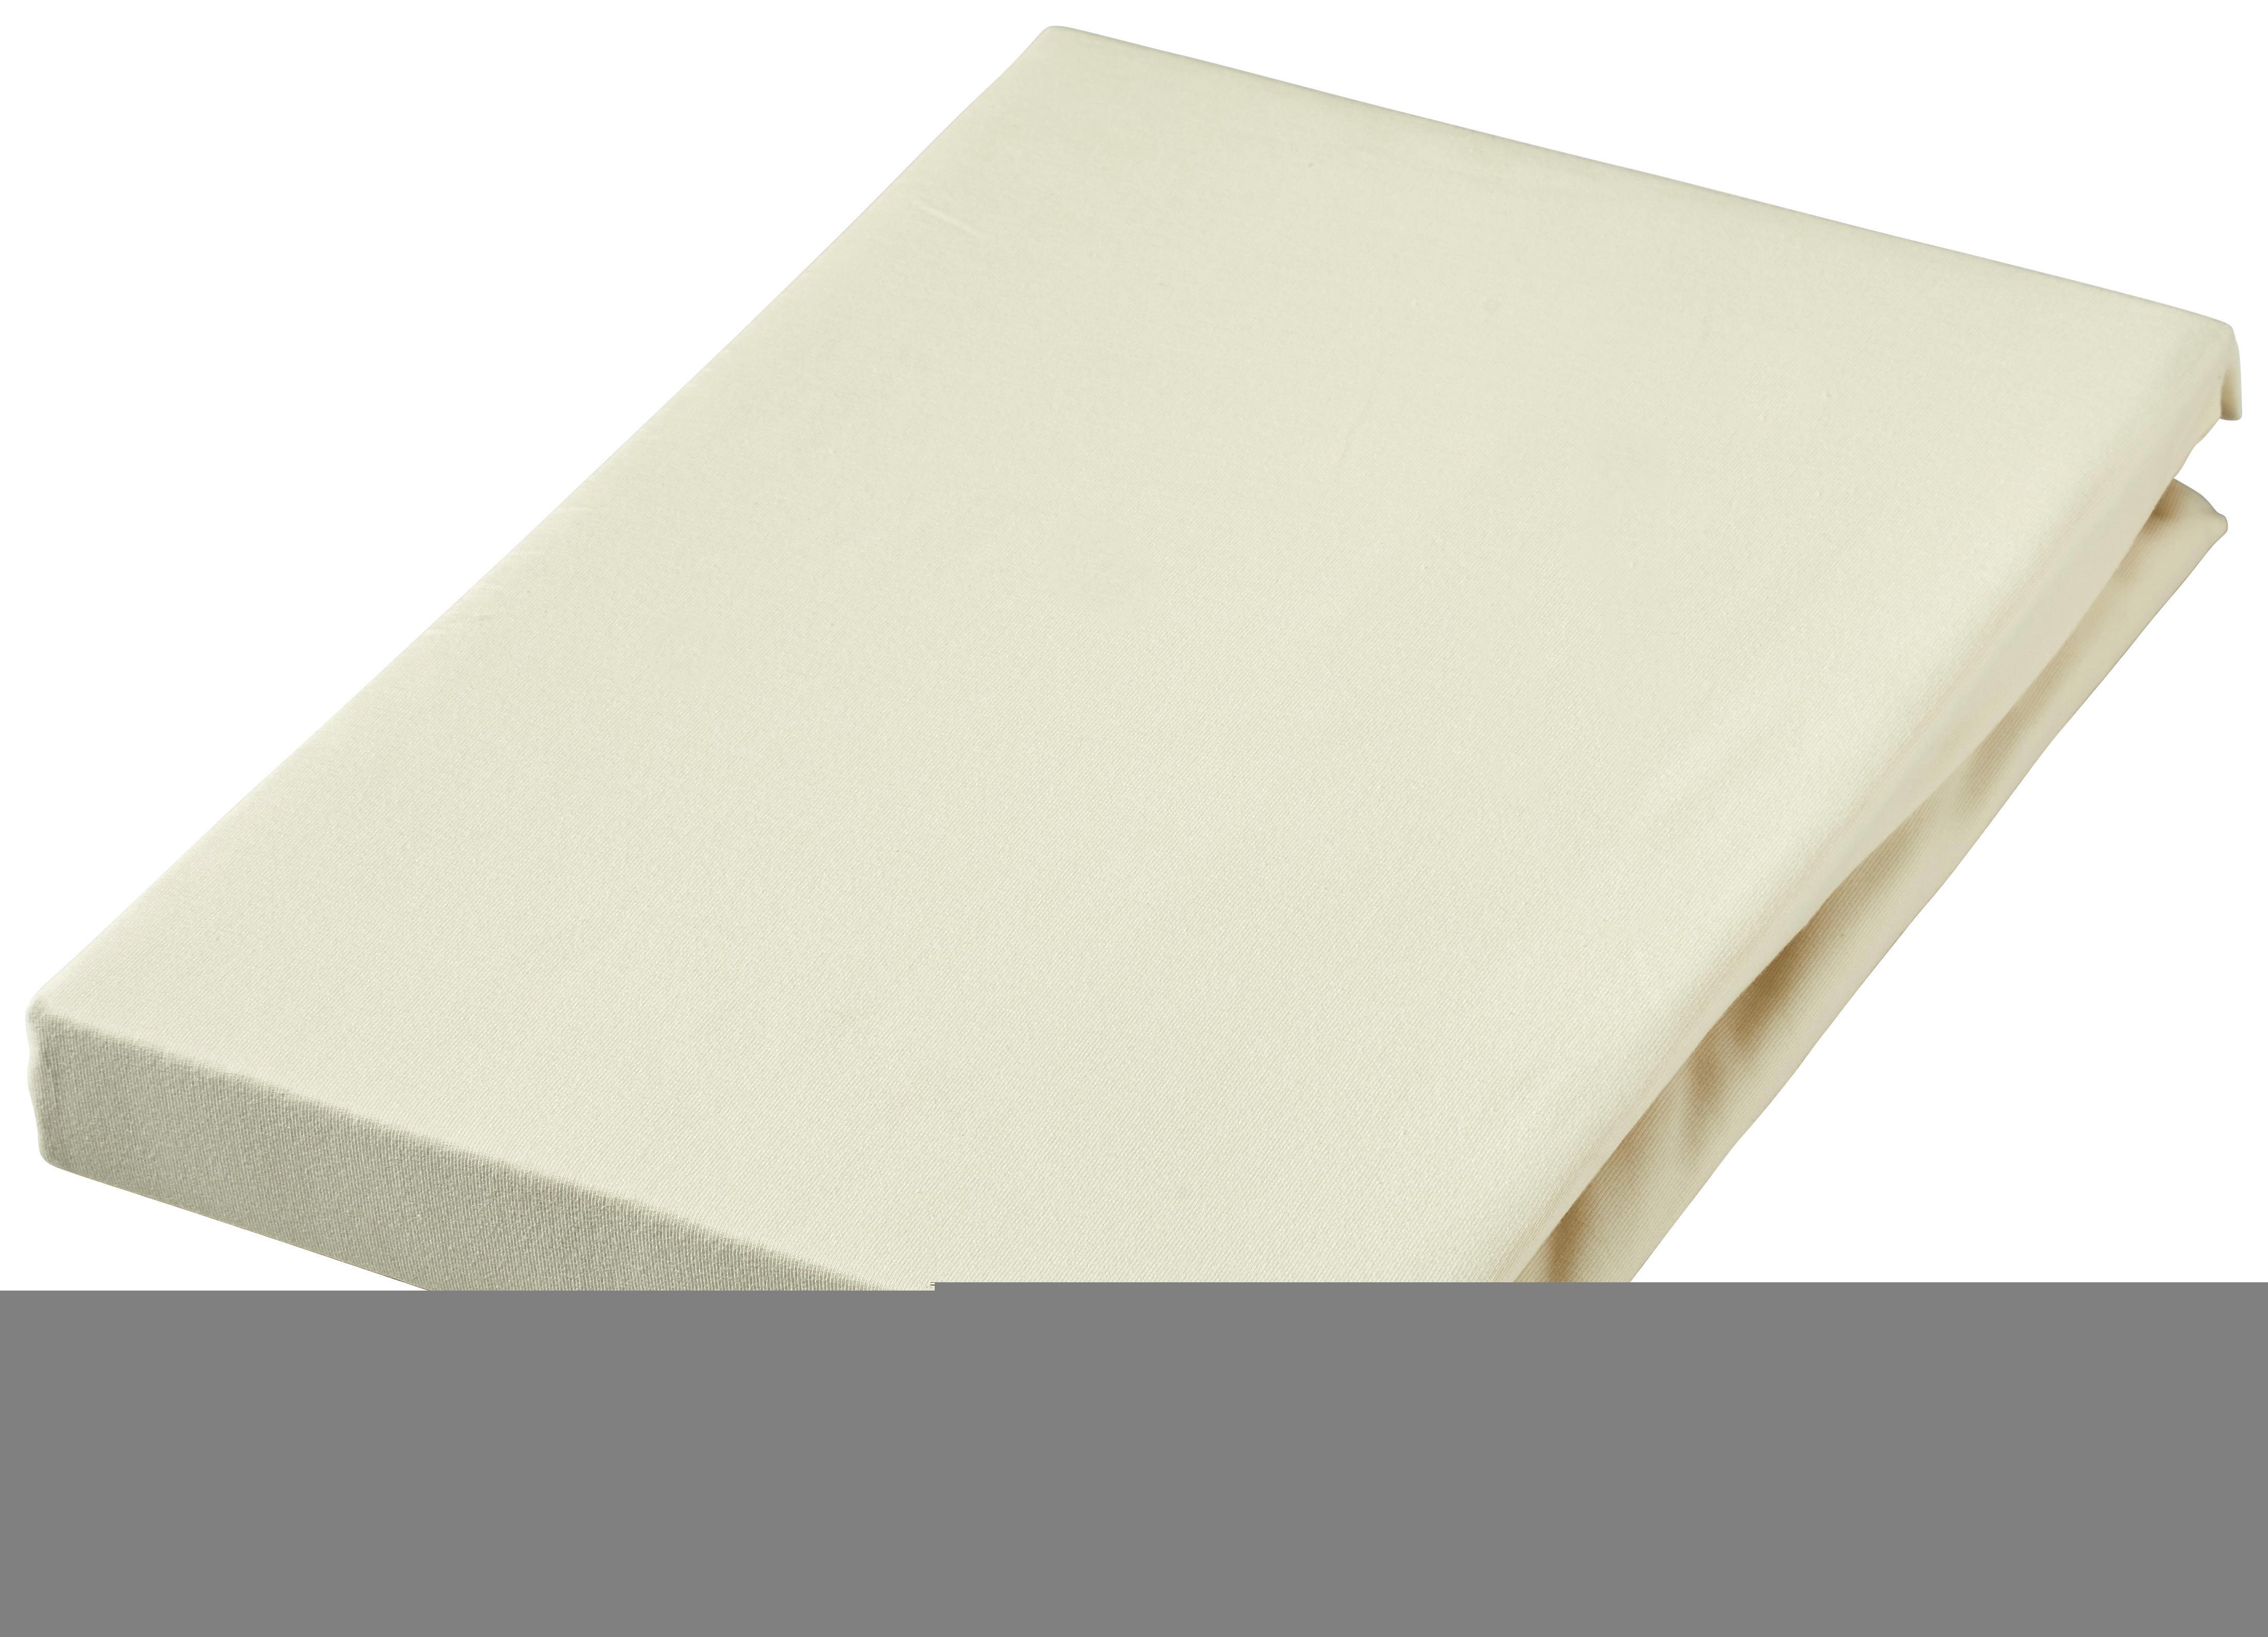 SPANNLEINTUCH 90/190 cm - Creme, Textil (90/190cm) - SCHLAFGUT